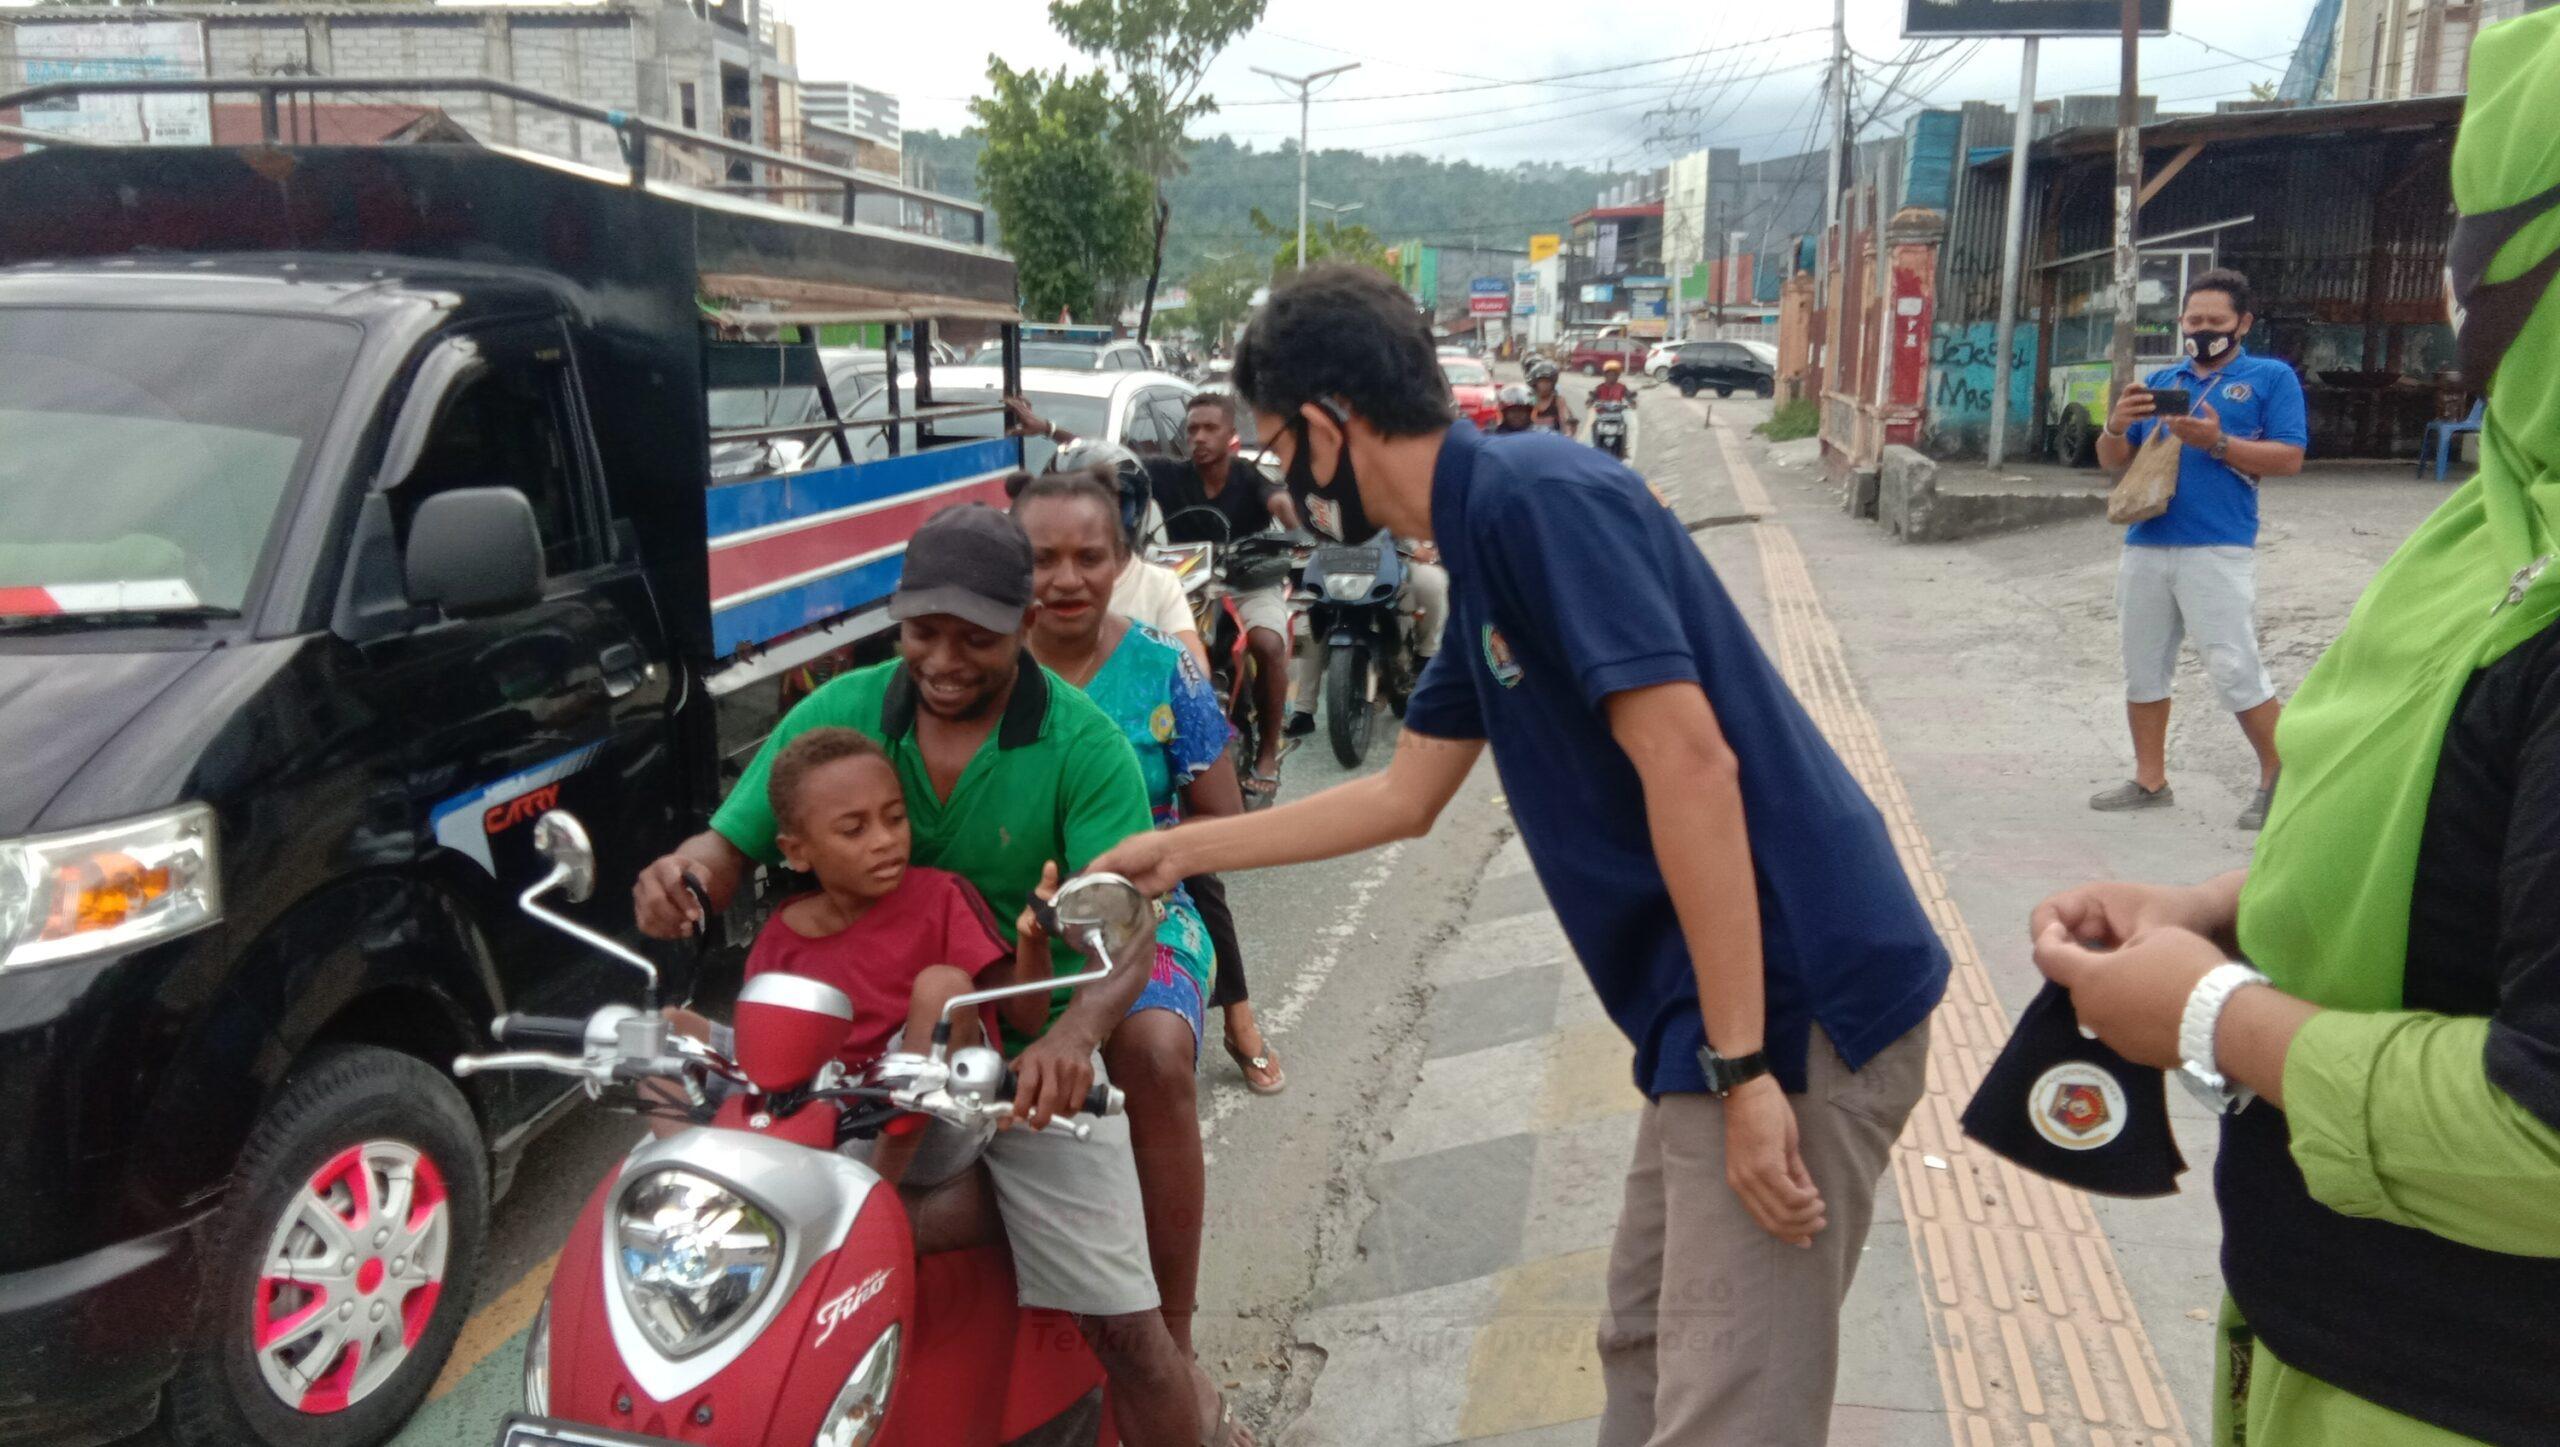 PWI Papua Barat Bagi 1000 Masker di Manokwari 17 IMG 20210207 WA0108 1 scaled